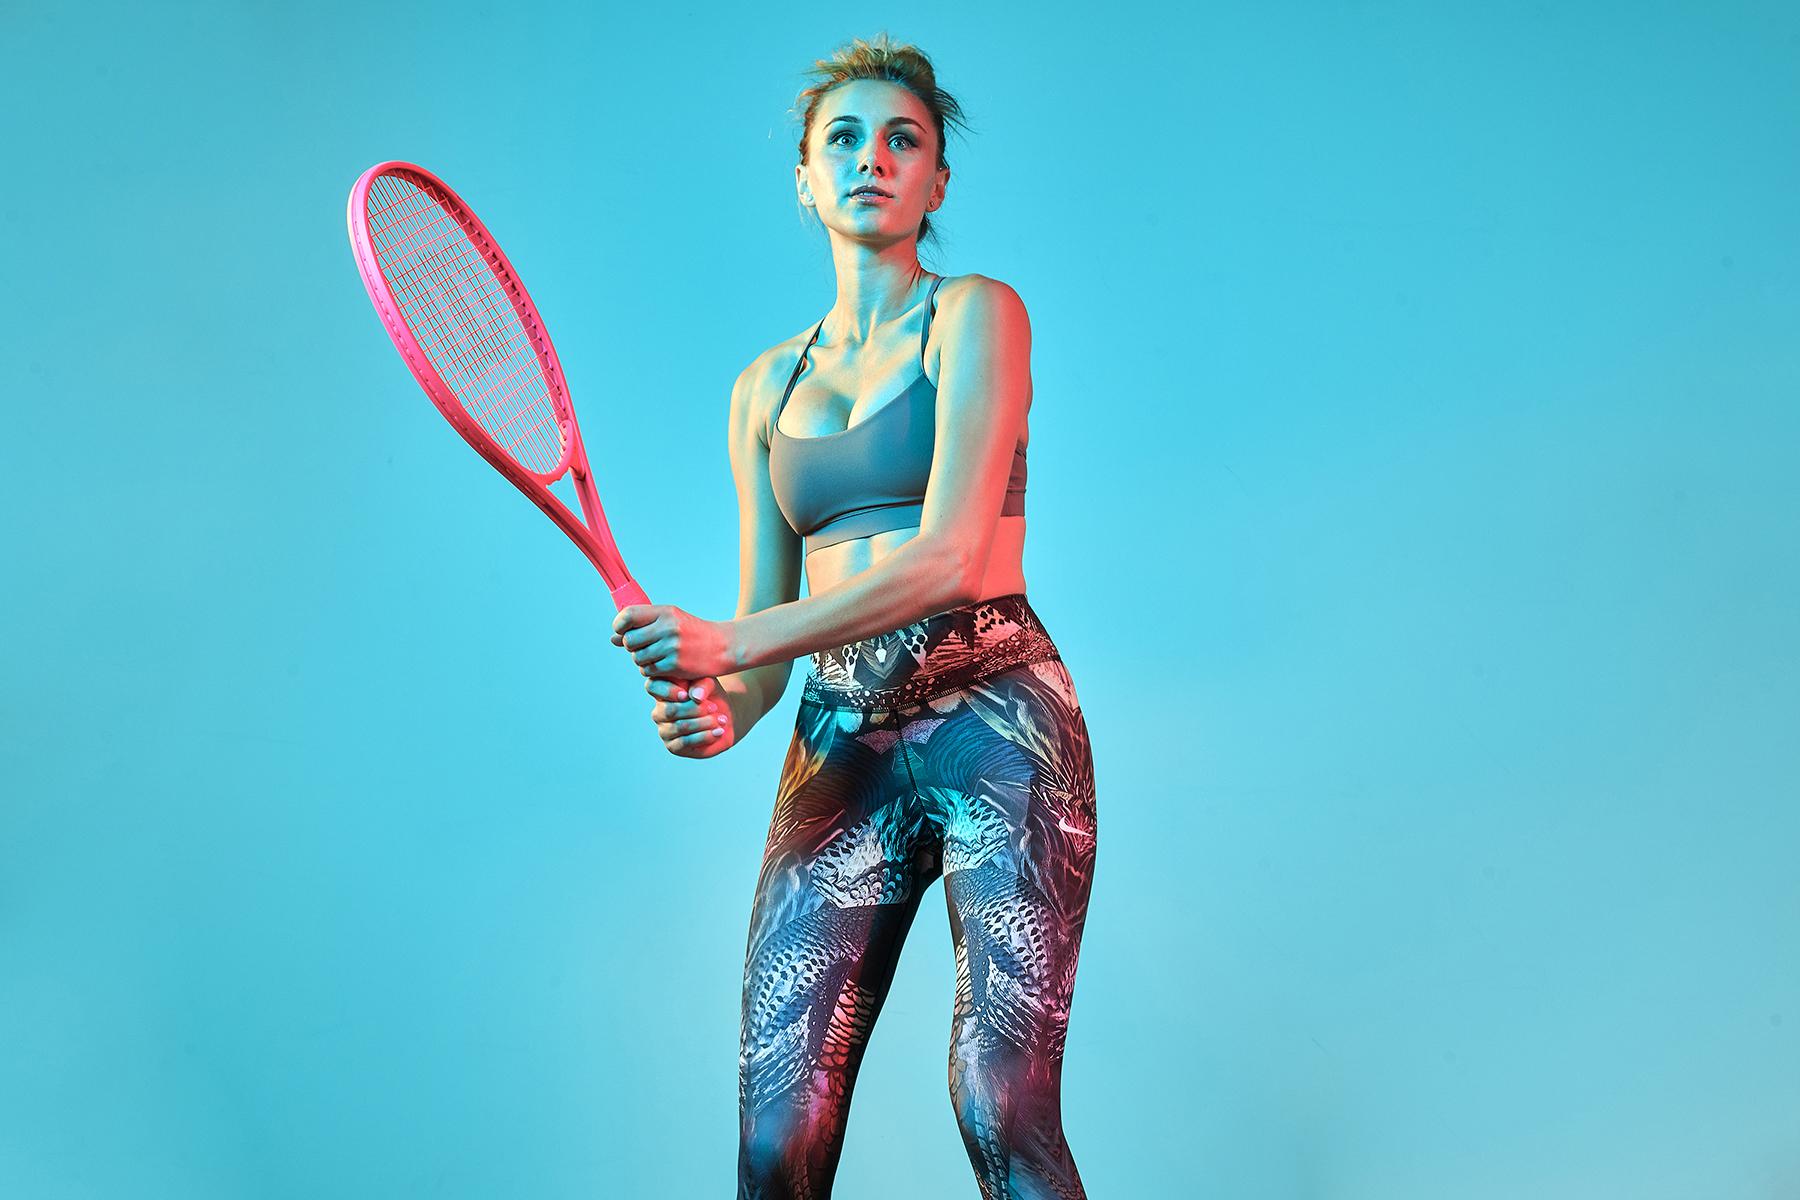 20181111_Tennis11421_FINAL_WEB.jpg